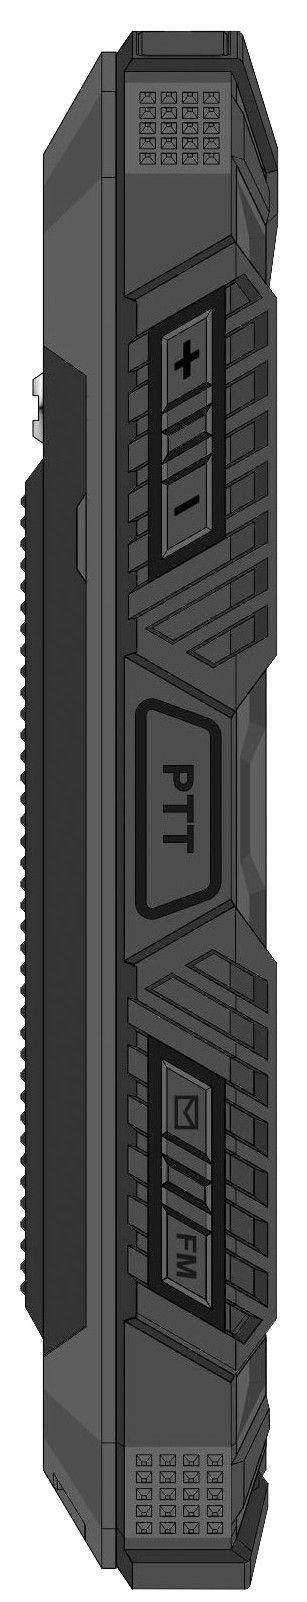 Мобильный телефон Sigma mobile X-treme PQ15 Black - 3